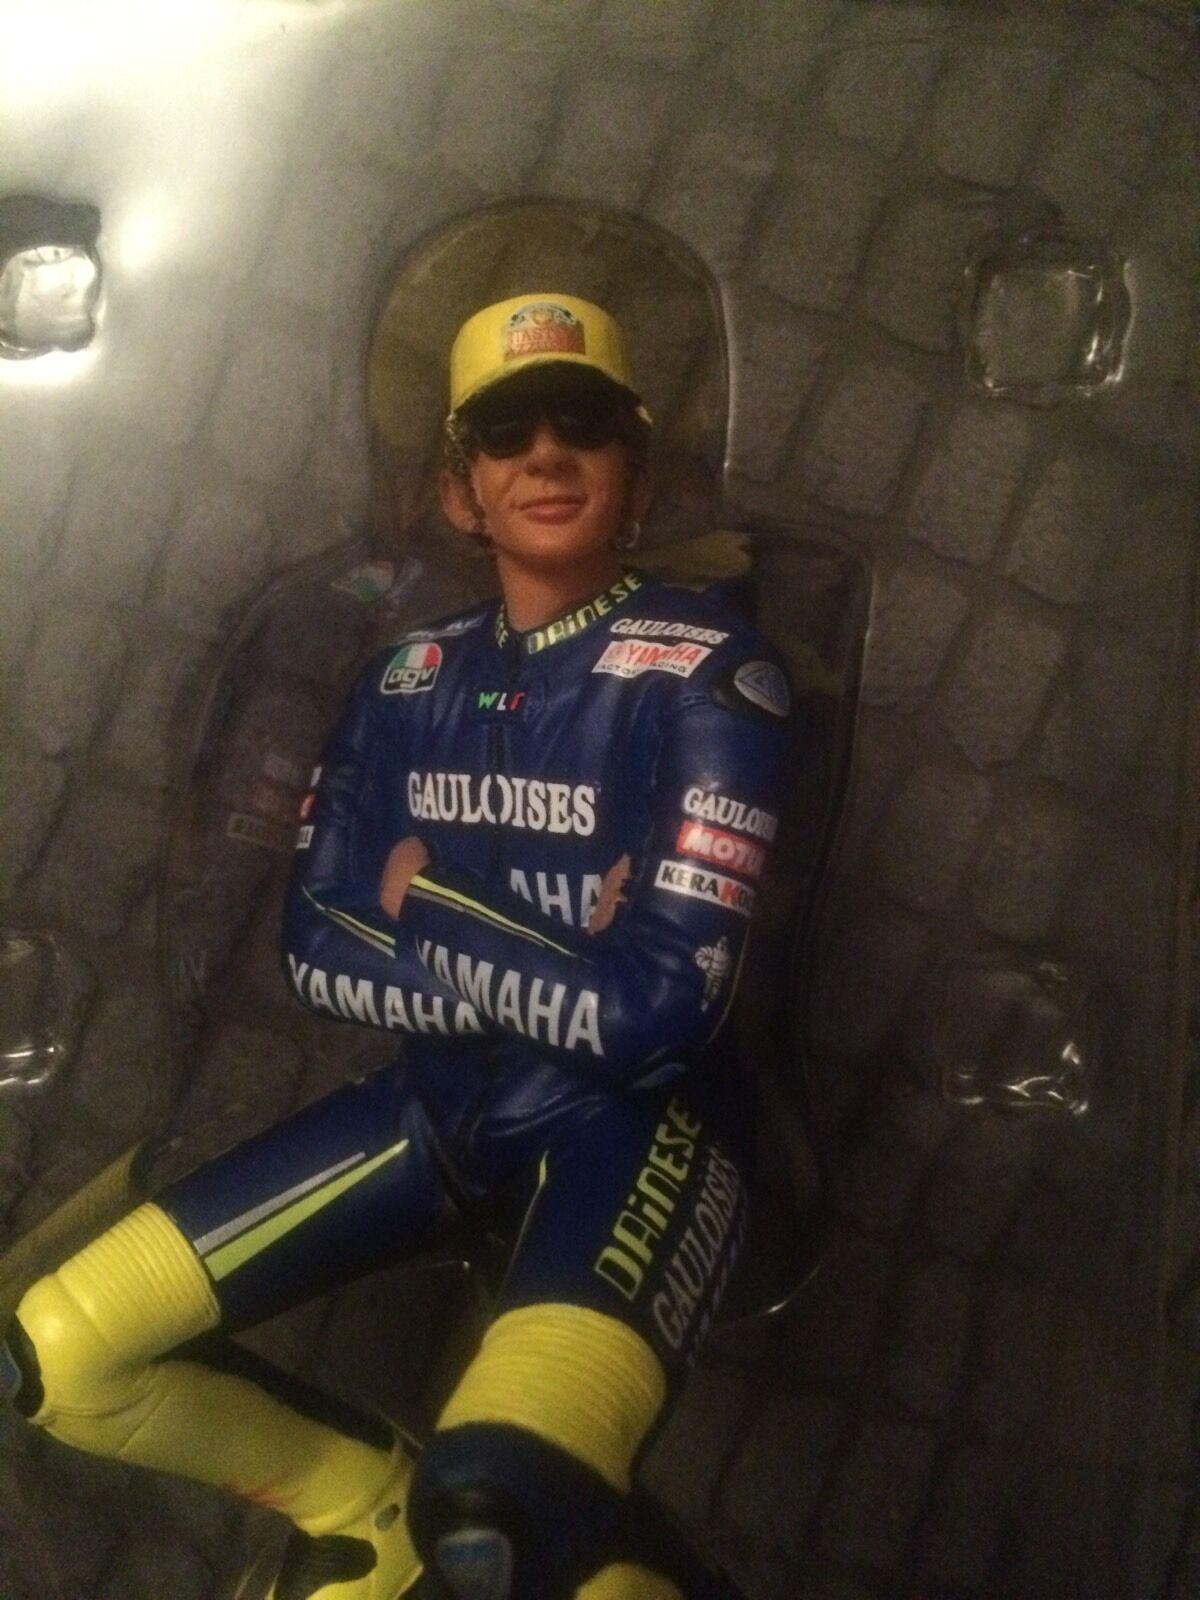 Valentino Rossi Minichamps 2005 Riding Figure Full GAULOISES TABAC sponsor